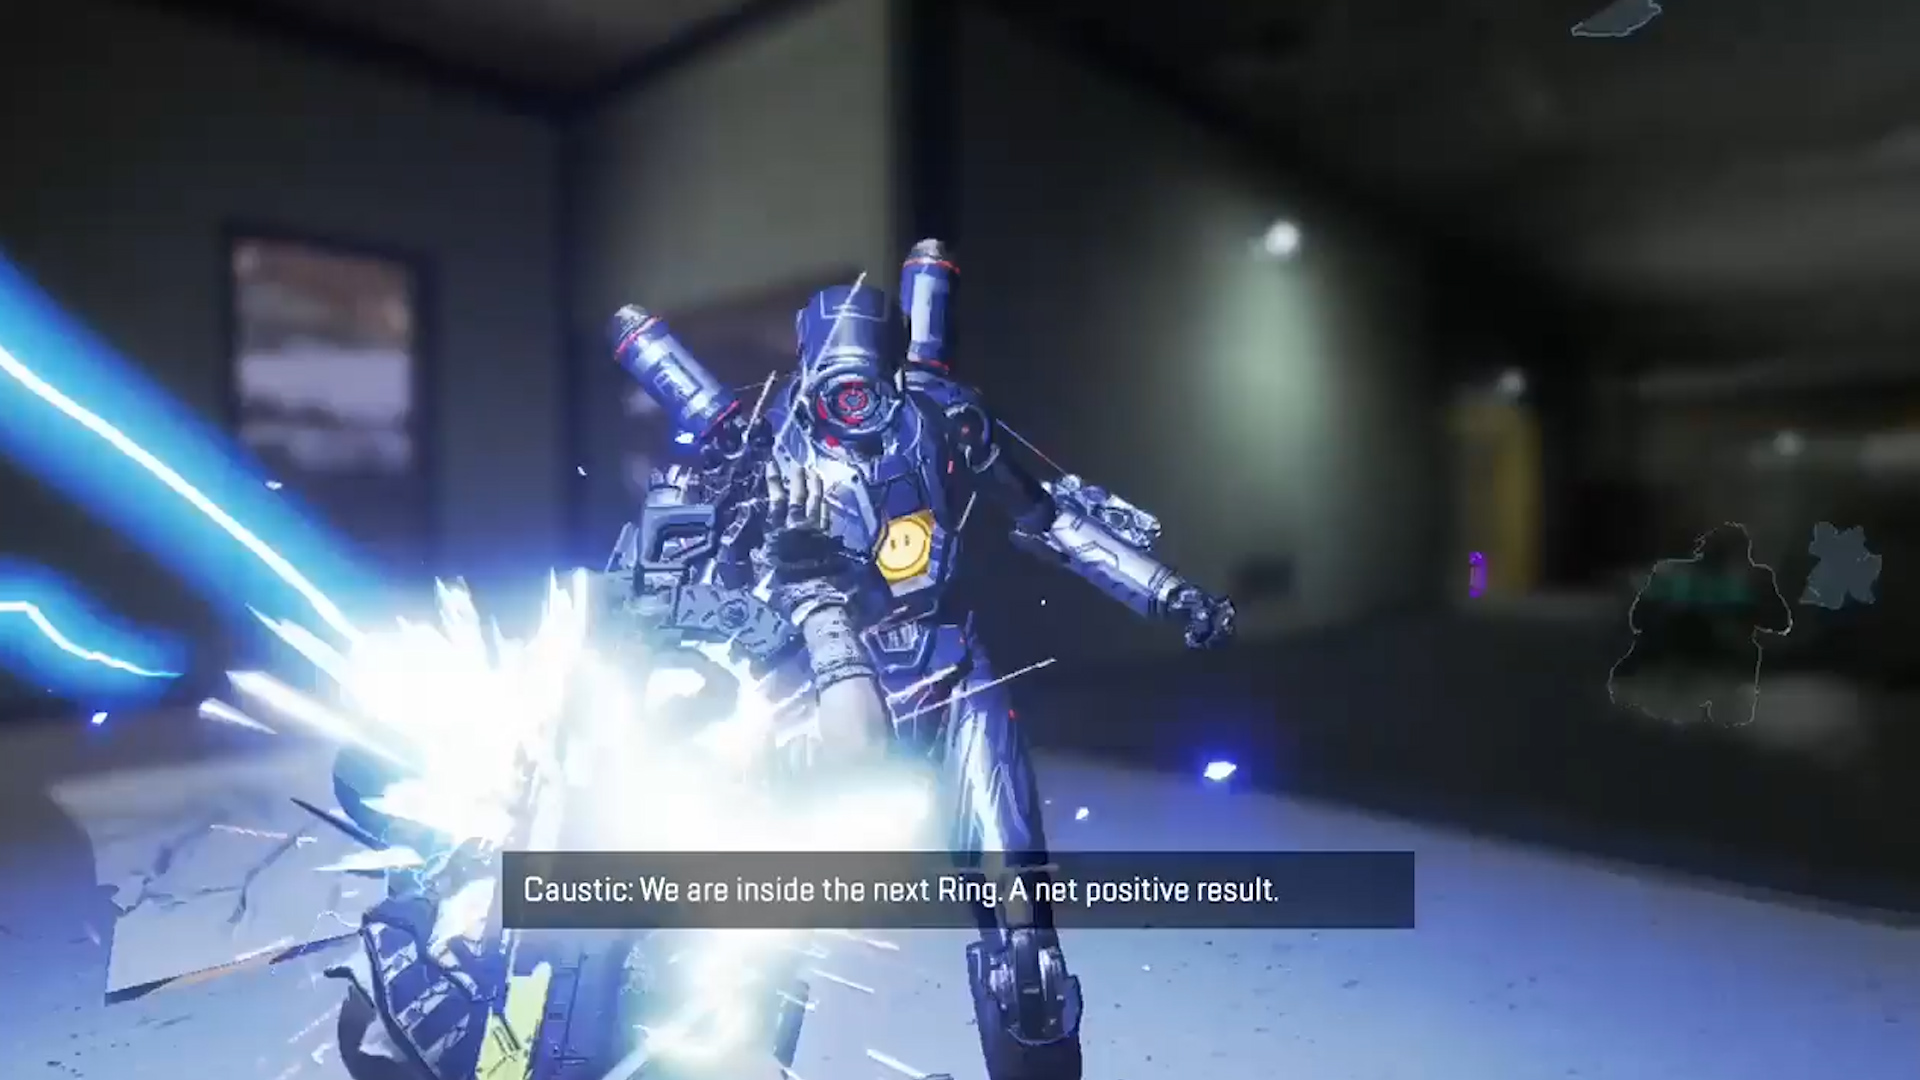 【APEX】アークスターの爆発タイミングが完璧過ぎて電気攻撃に見えるフィニッシャー